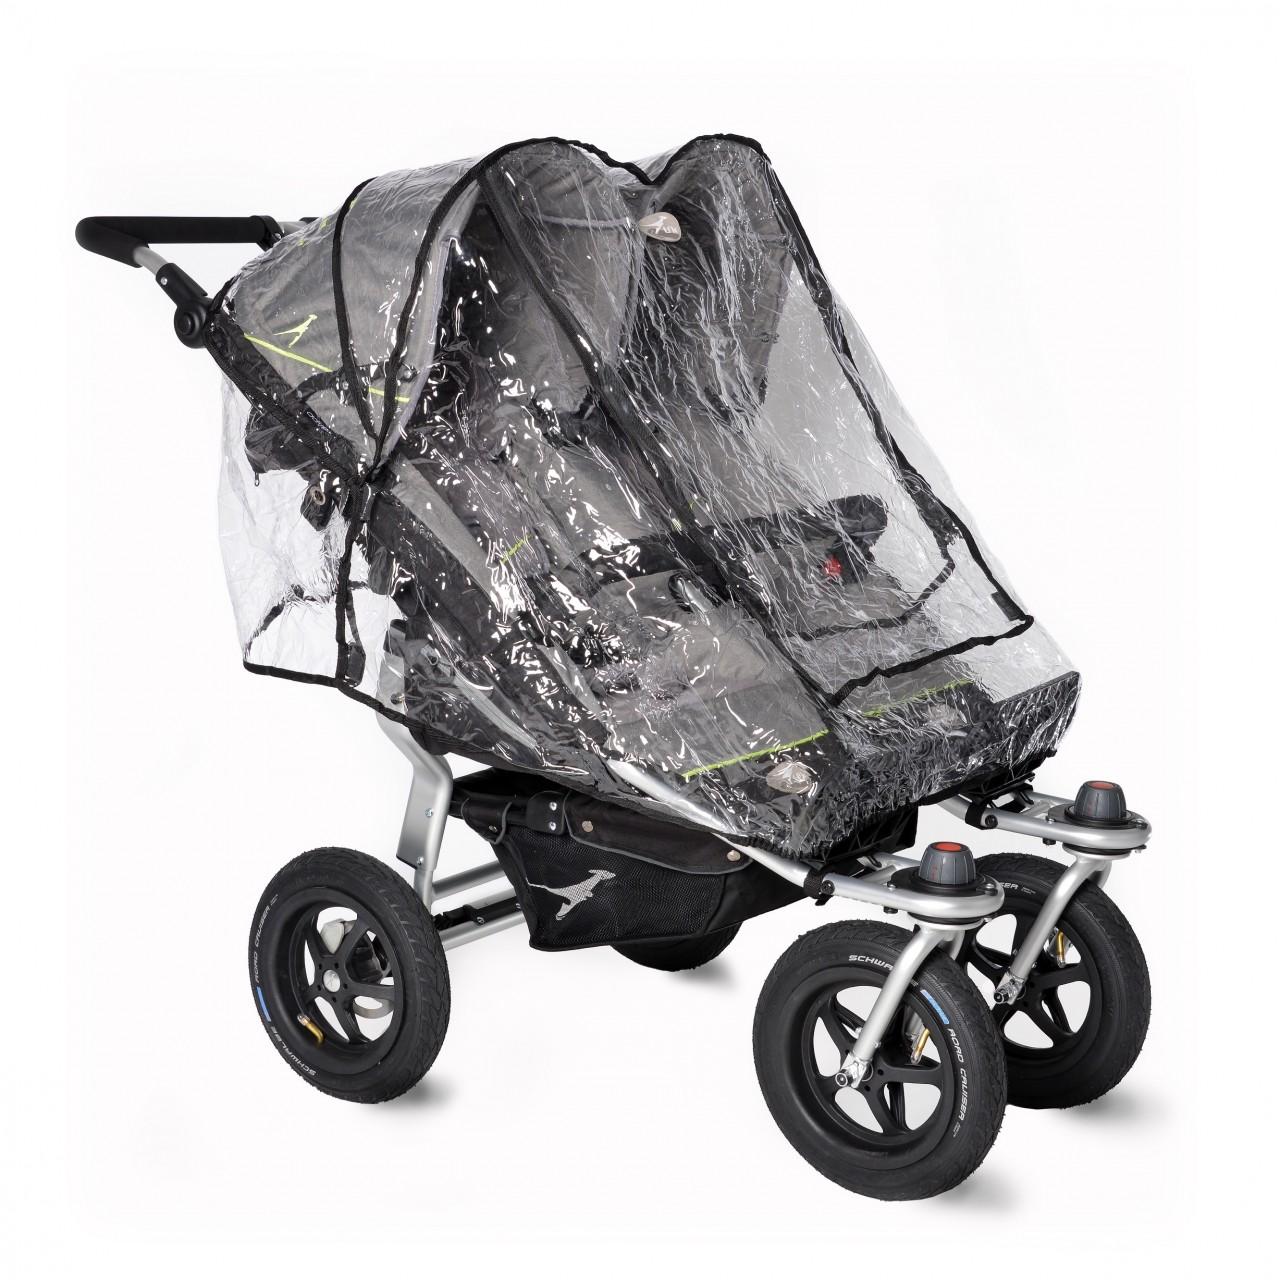 Regenverdeck - Doppelsitz - TWIN adventure